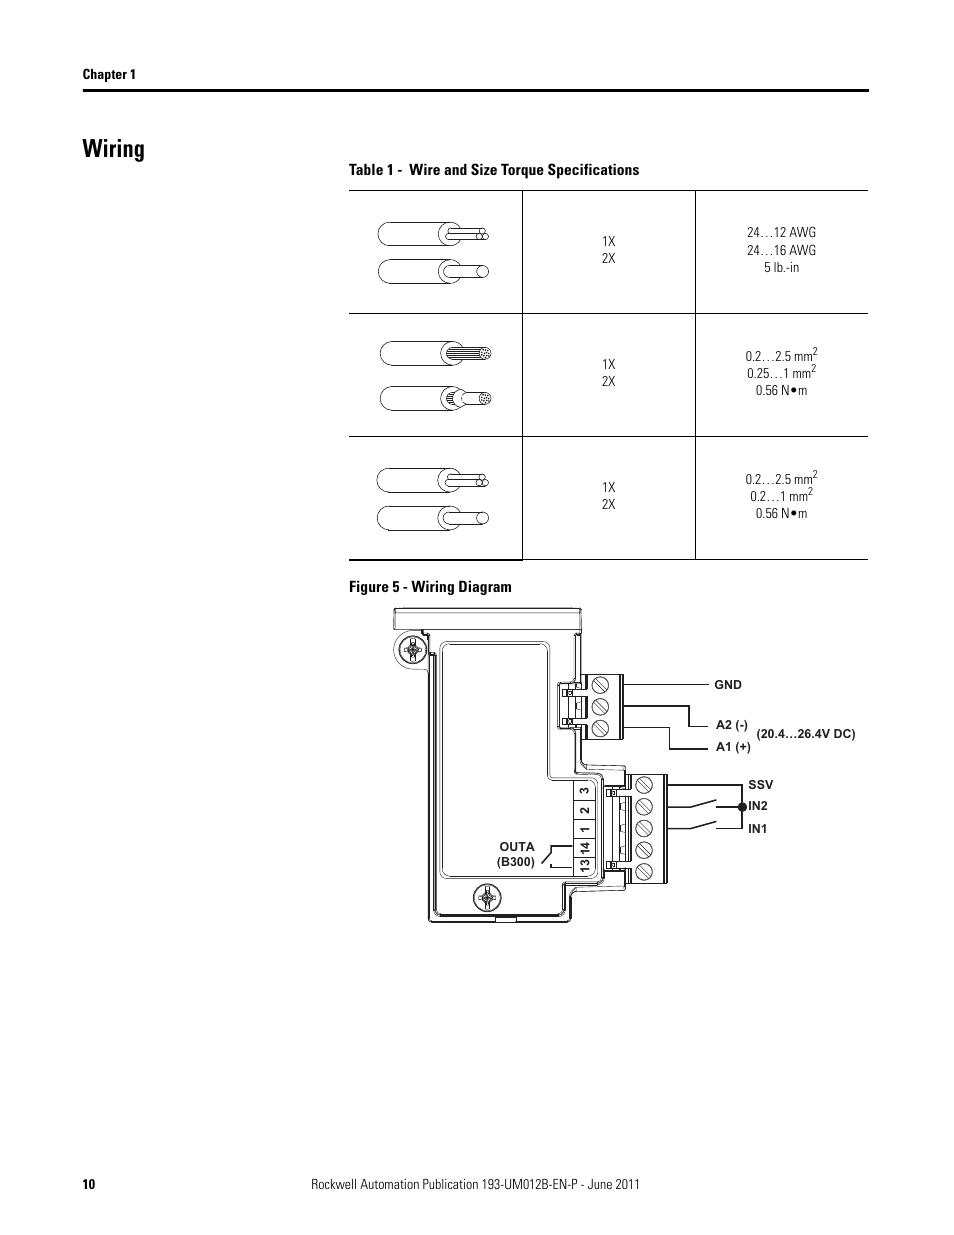 medium resolution of e1 wiring diagram wiring diagrame1 wiring diagram